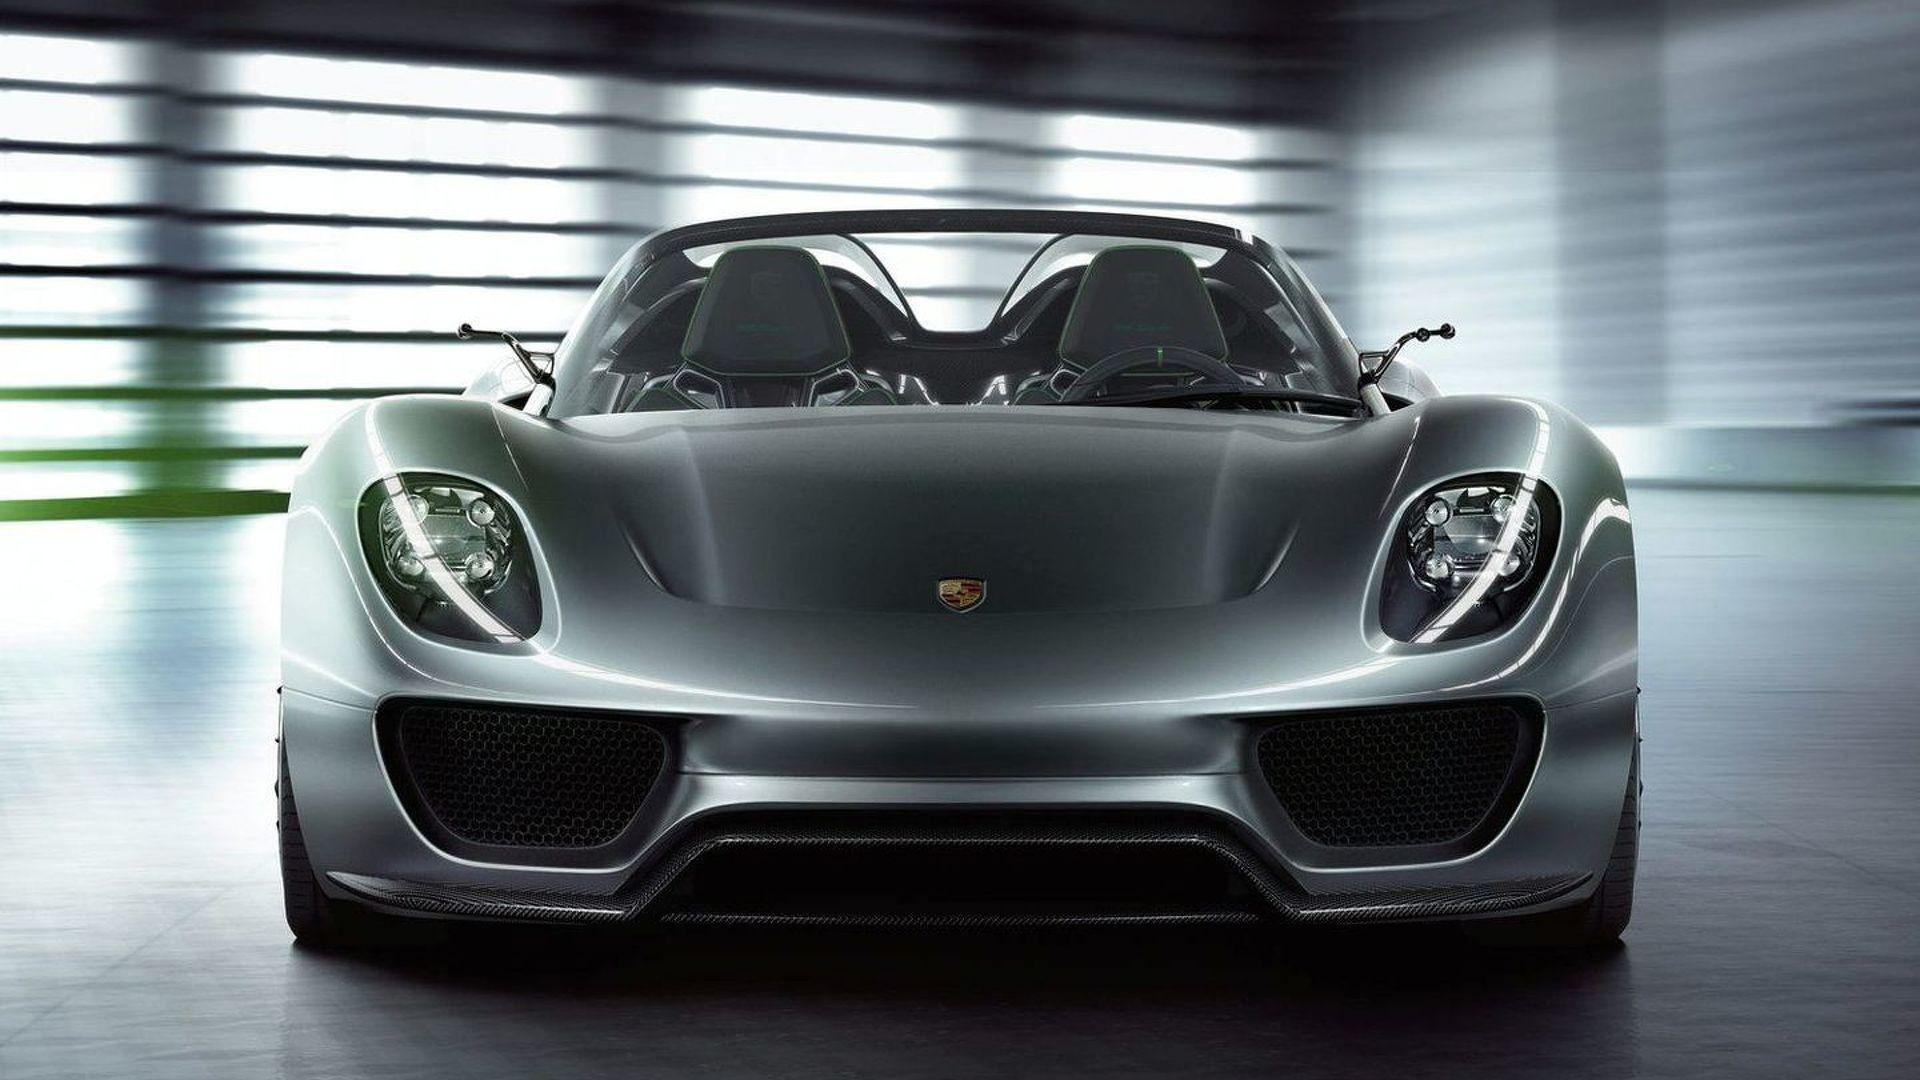 2010-195841-porsche-918-spyder-super-sports-hybrid-concept-1600-02-30-20101 Fabulous Porsche 918 Spyder Real Racing 3 Price Cars Trend